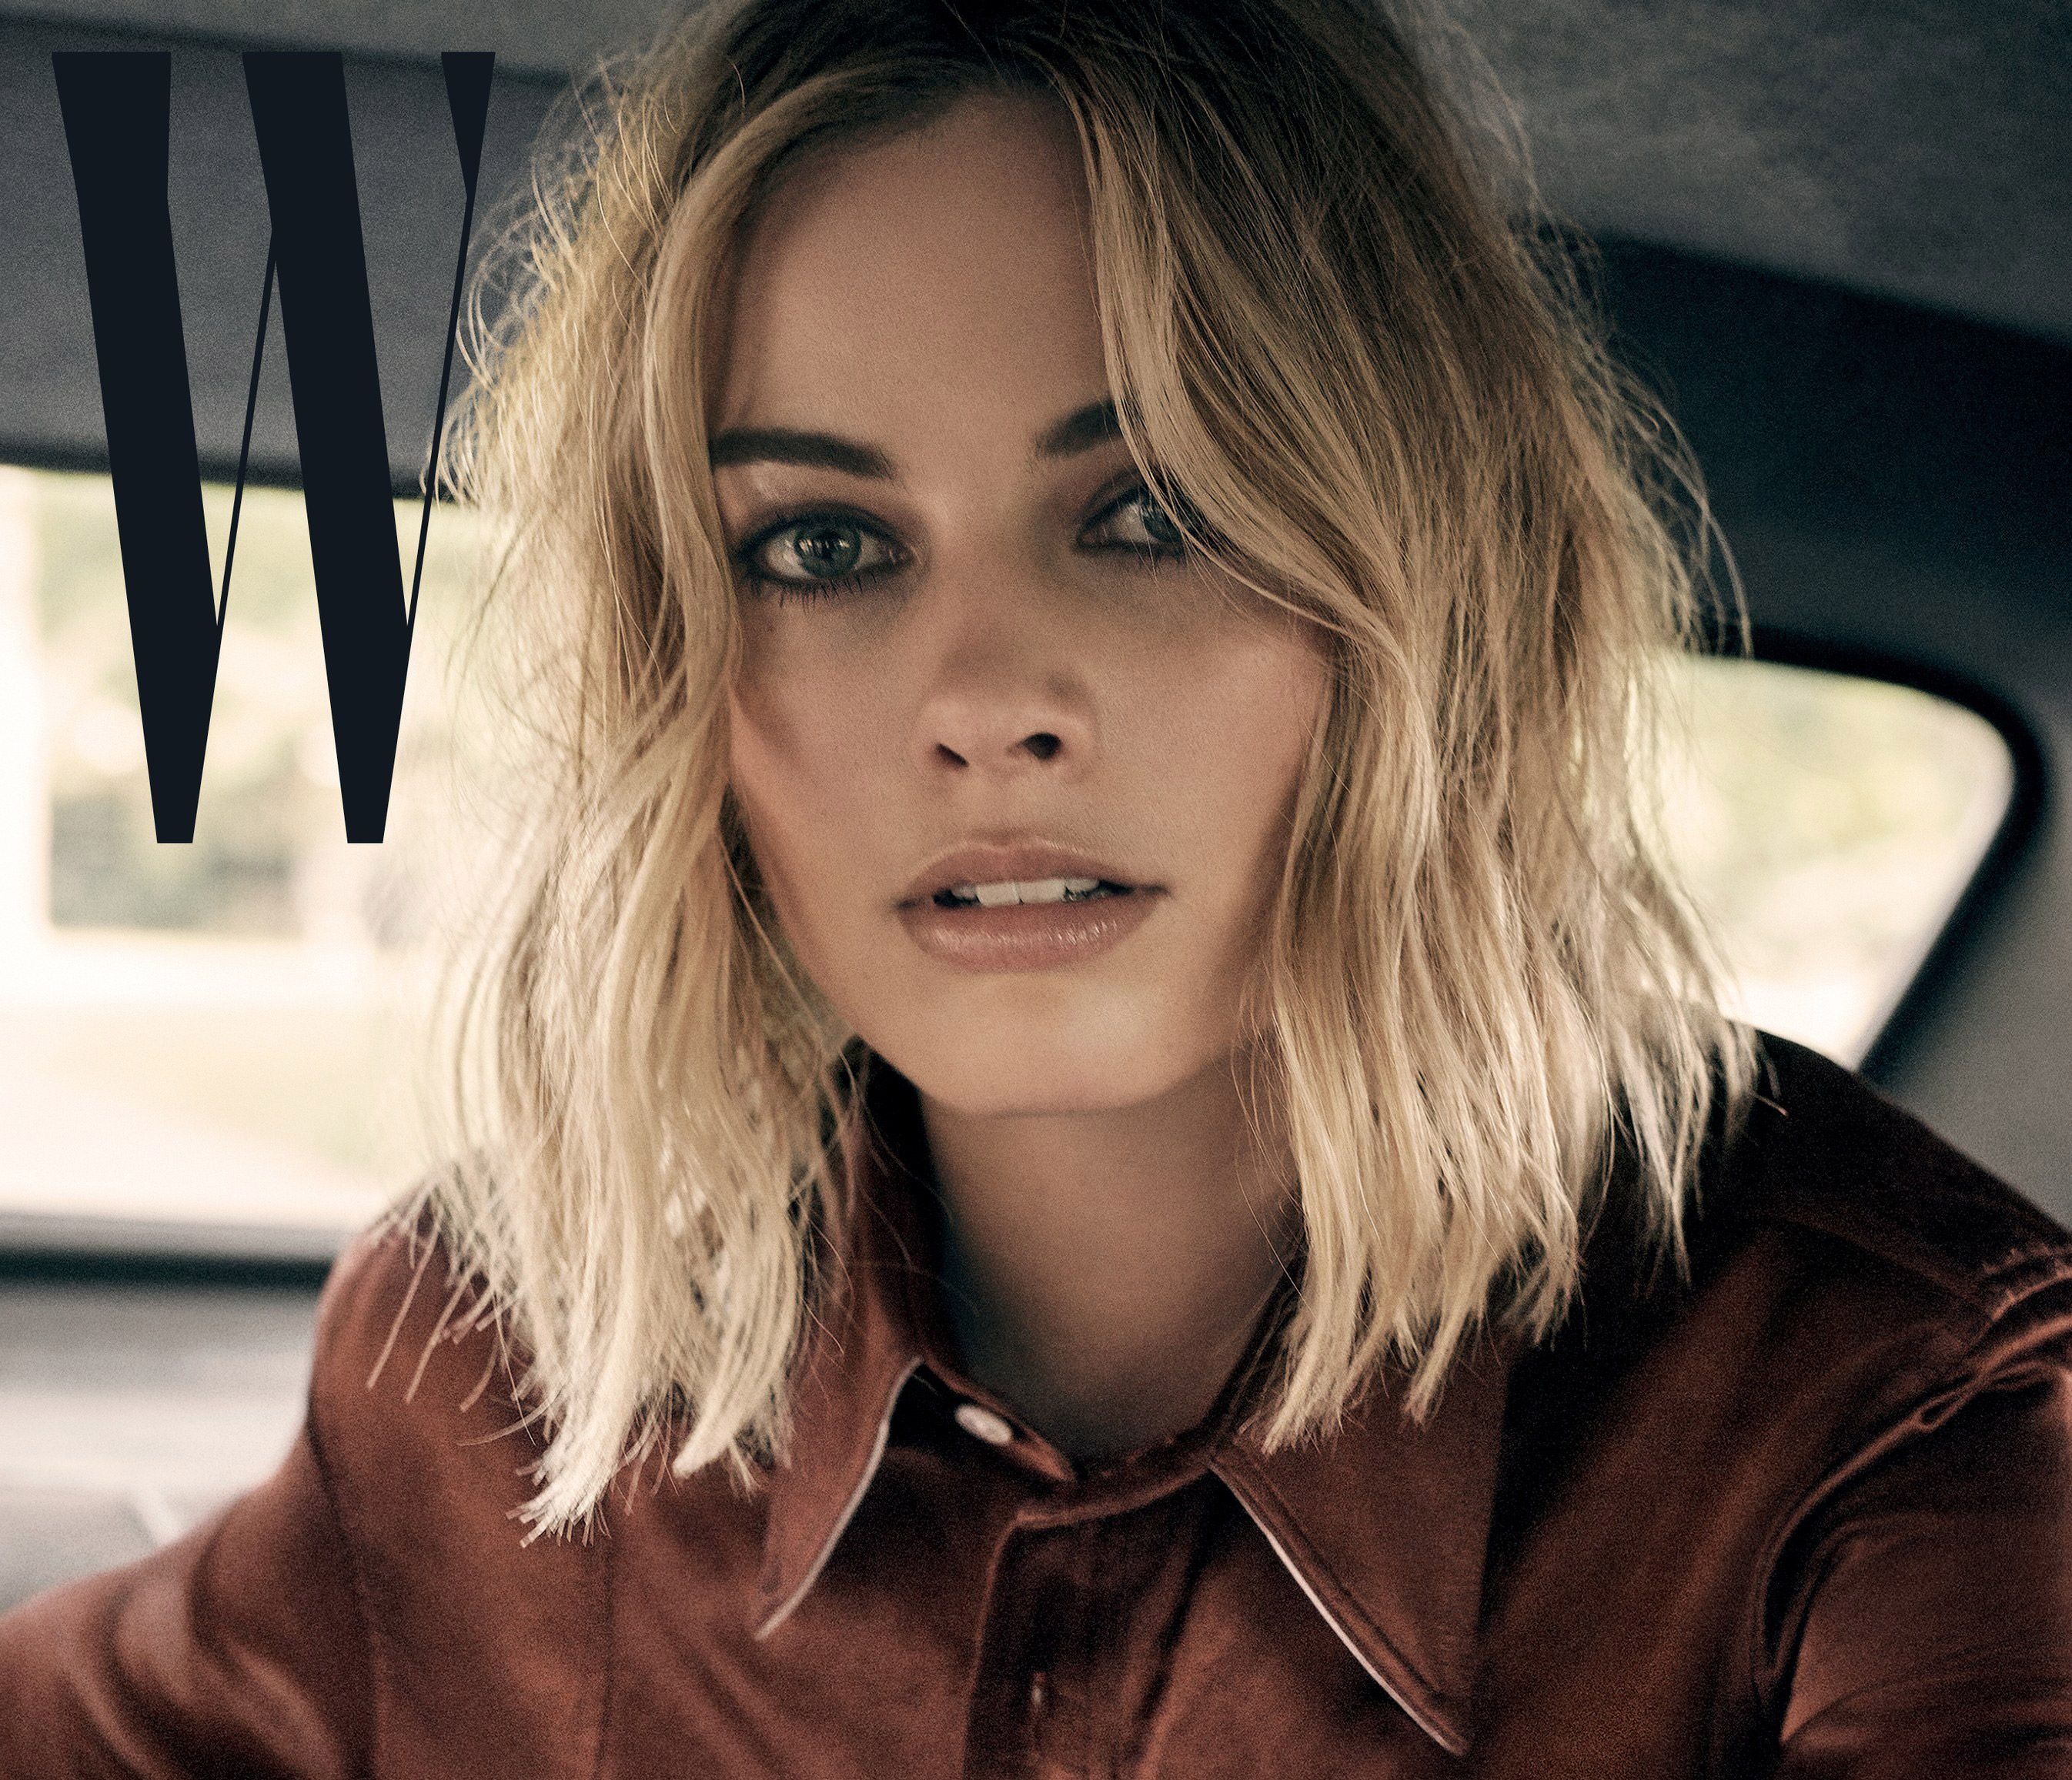 Margot Robbie 2018 Wallpapers - Wallpaper Cave